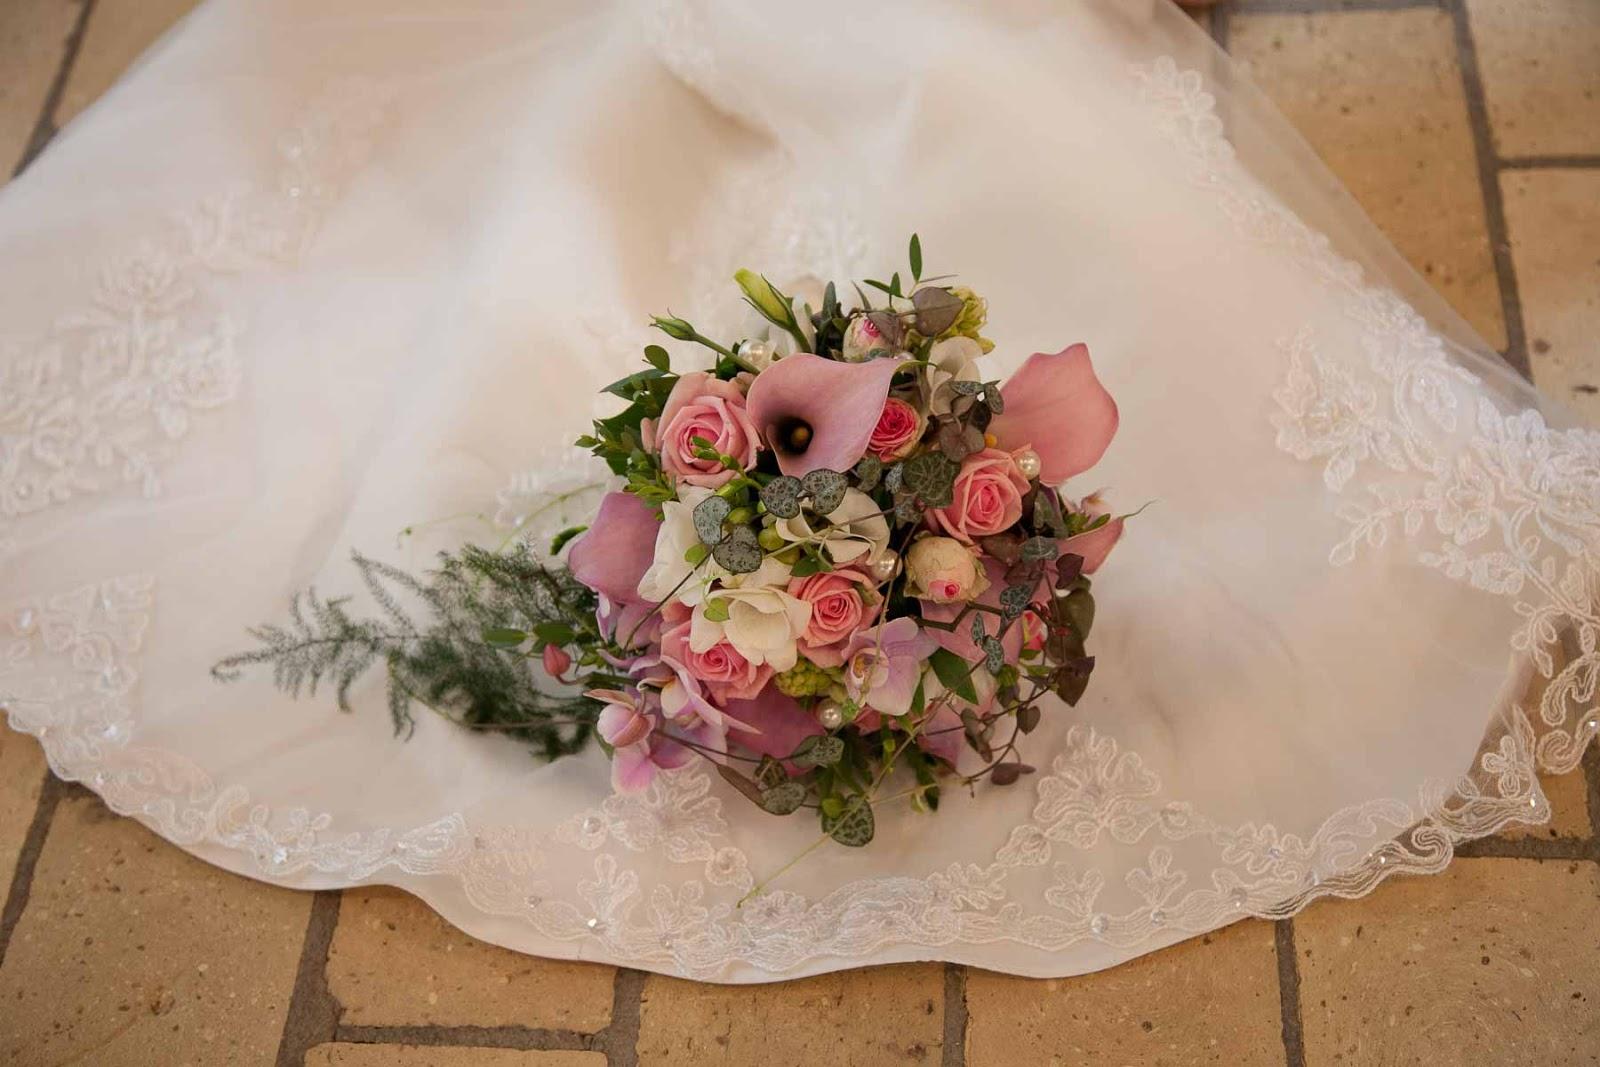 79a27cbb Bryllupsfotograf Sjælland, Jylland og Fyn: Planlægning af et bryllup